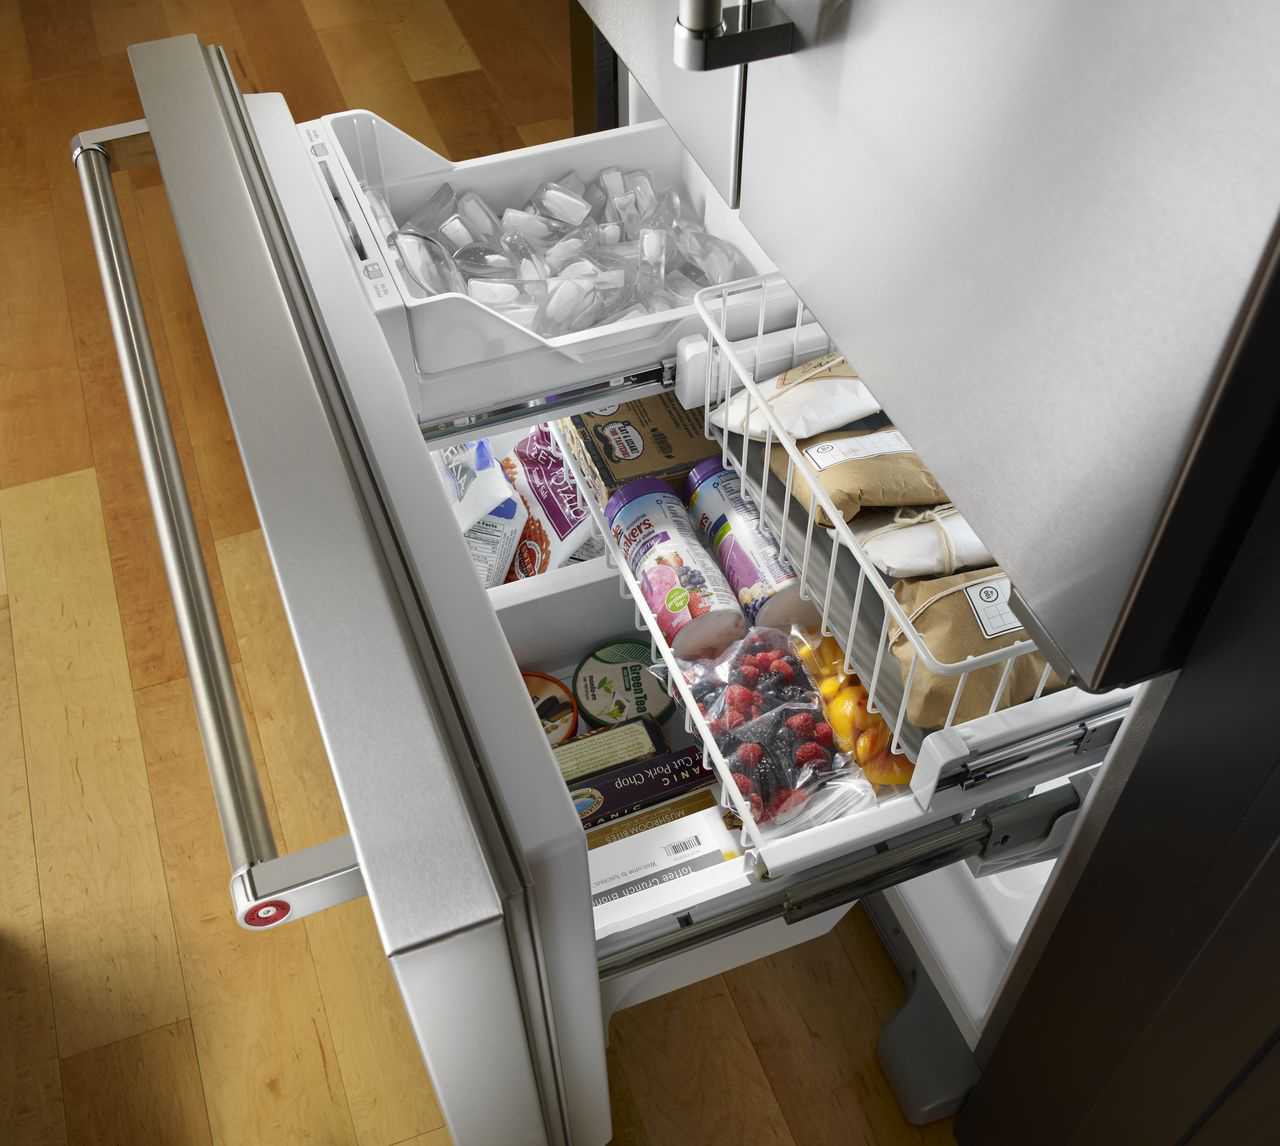 Kitchenaid Refrigerator Kitchenaid Overlay French Door Refrigerator  Krfc302Epa